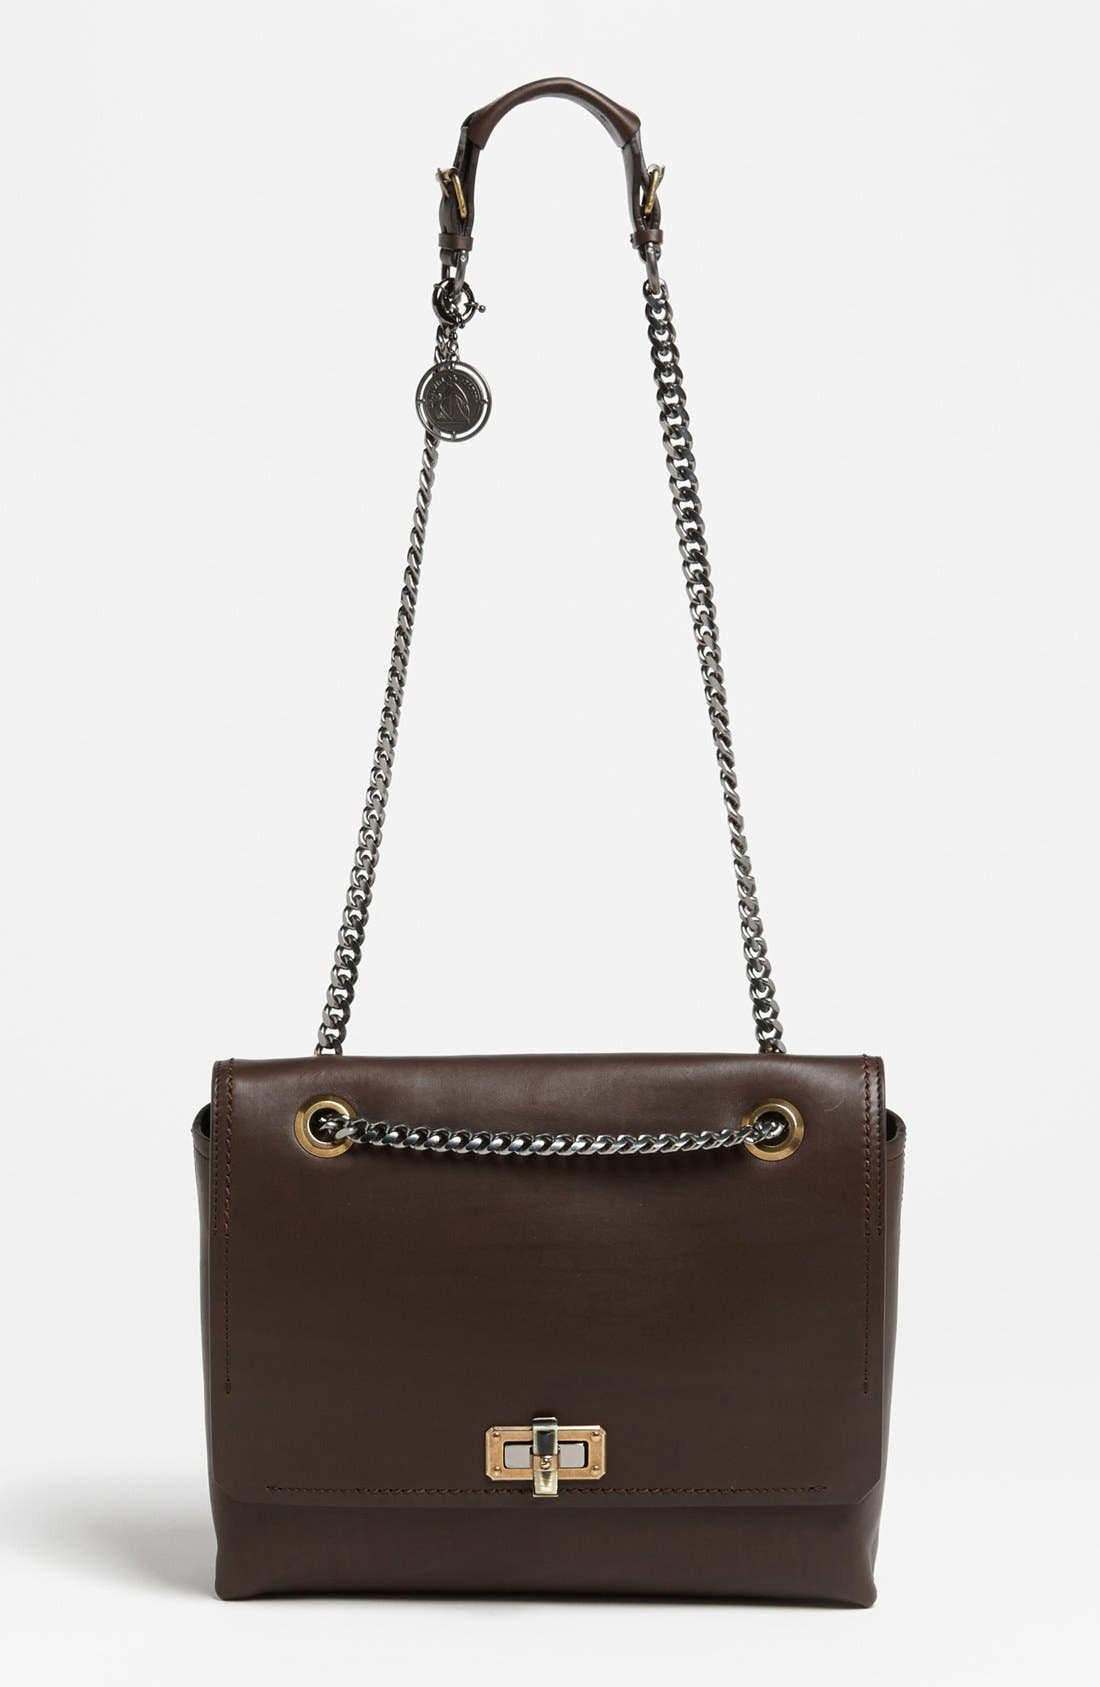 Main Image - Lanvin 'Happy - Medium' Leather Flap Shoulder Bag